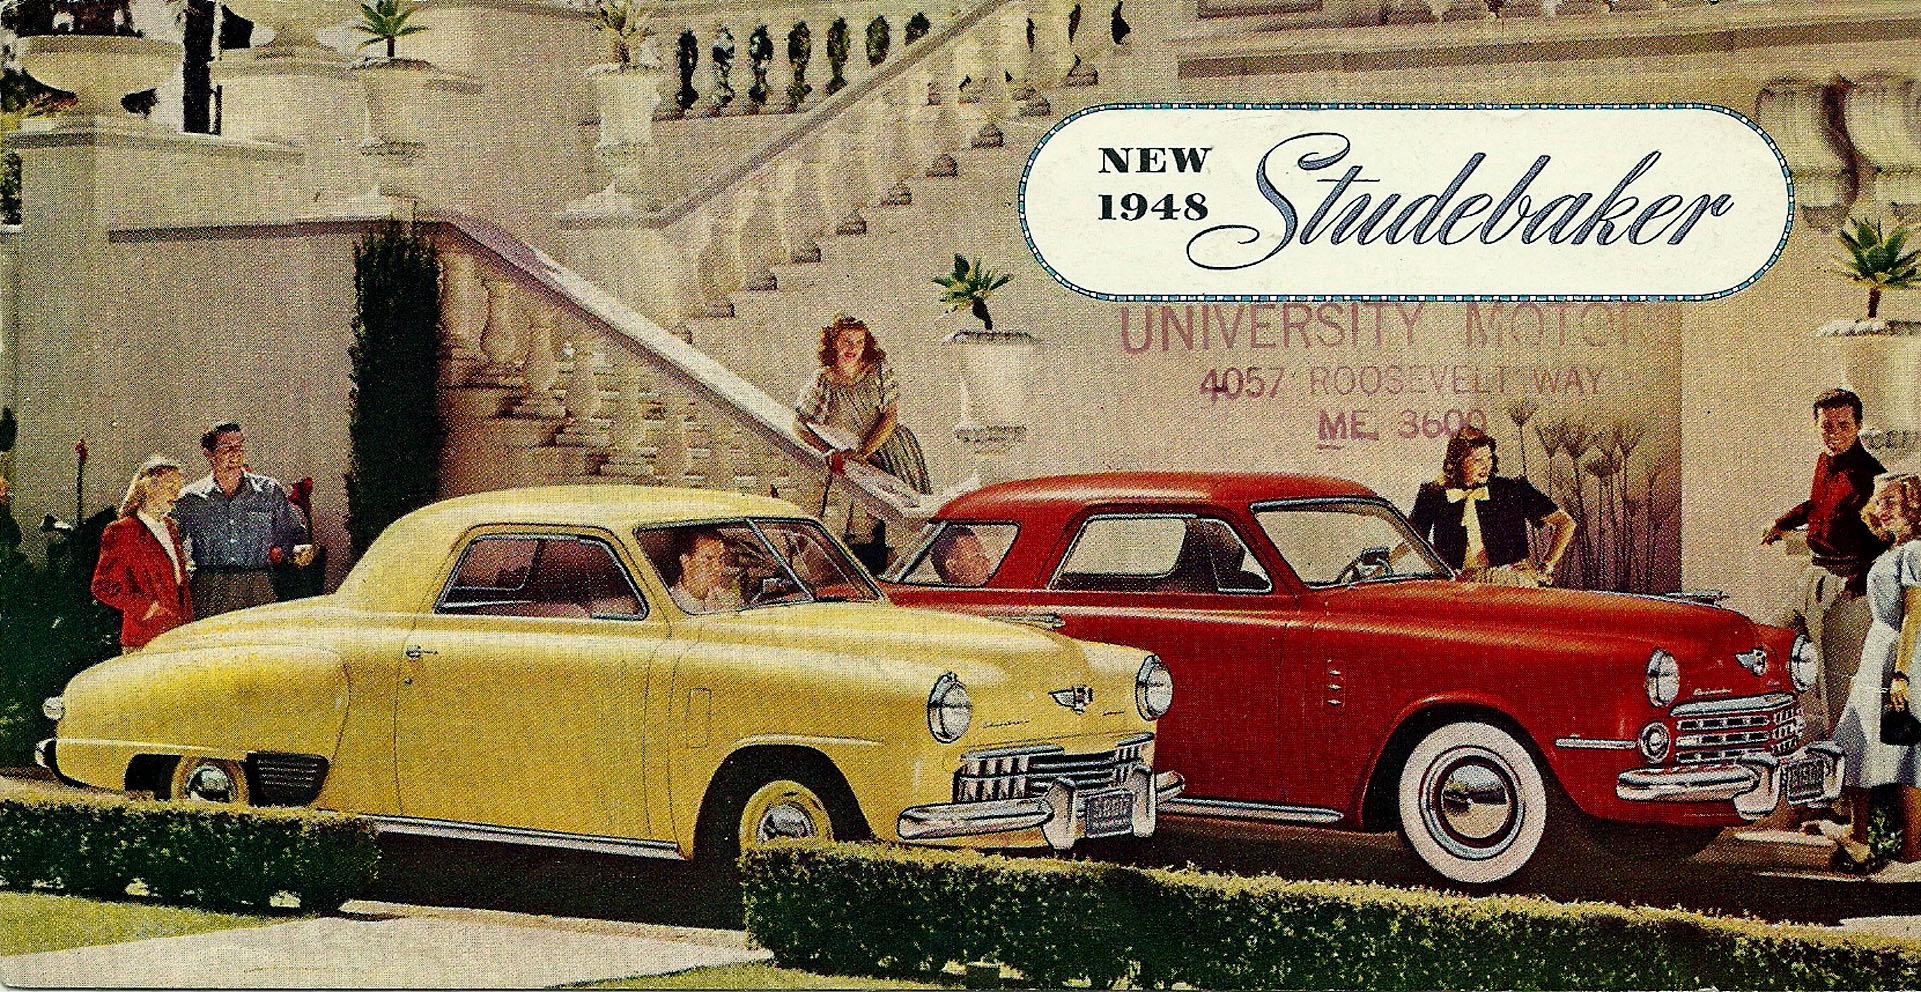 1948 Studebaker Foldout-01